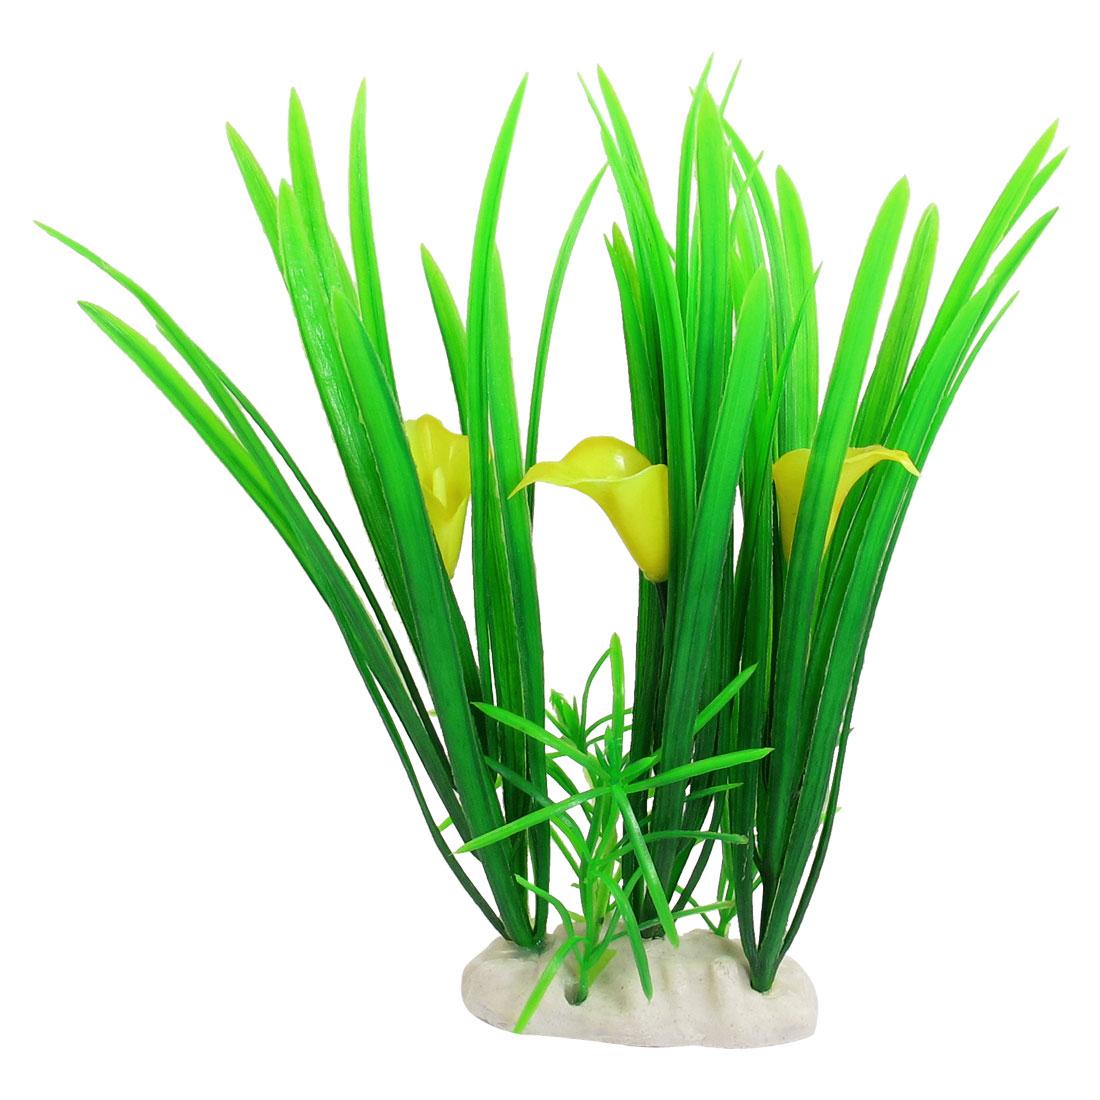 21cm Yellow Green Florescent Manmade Plastic Plants for Aquarium Fishbowl